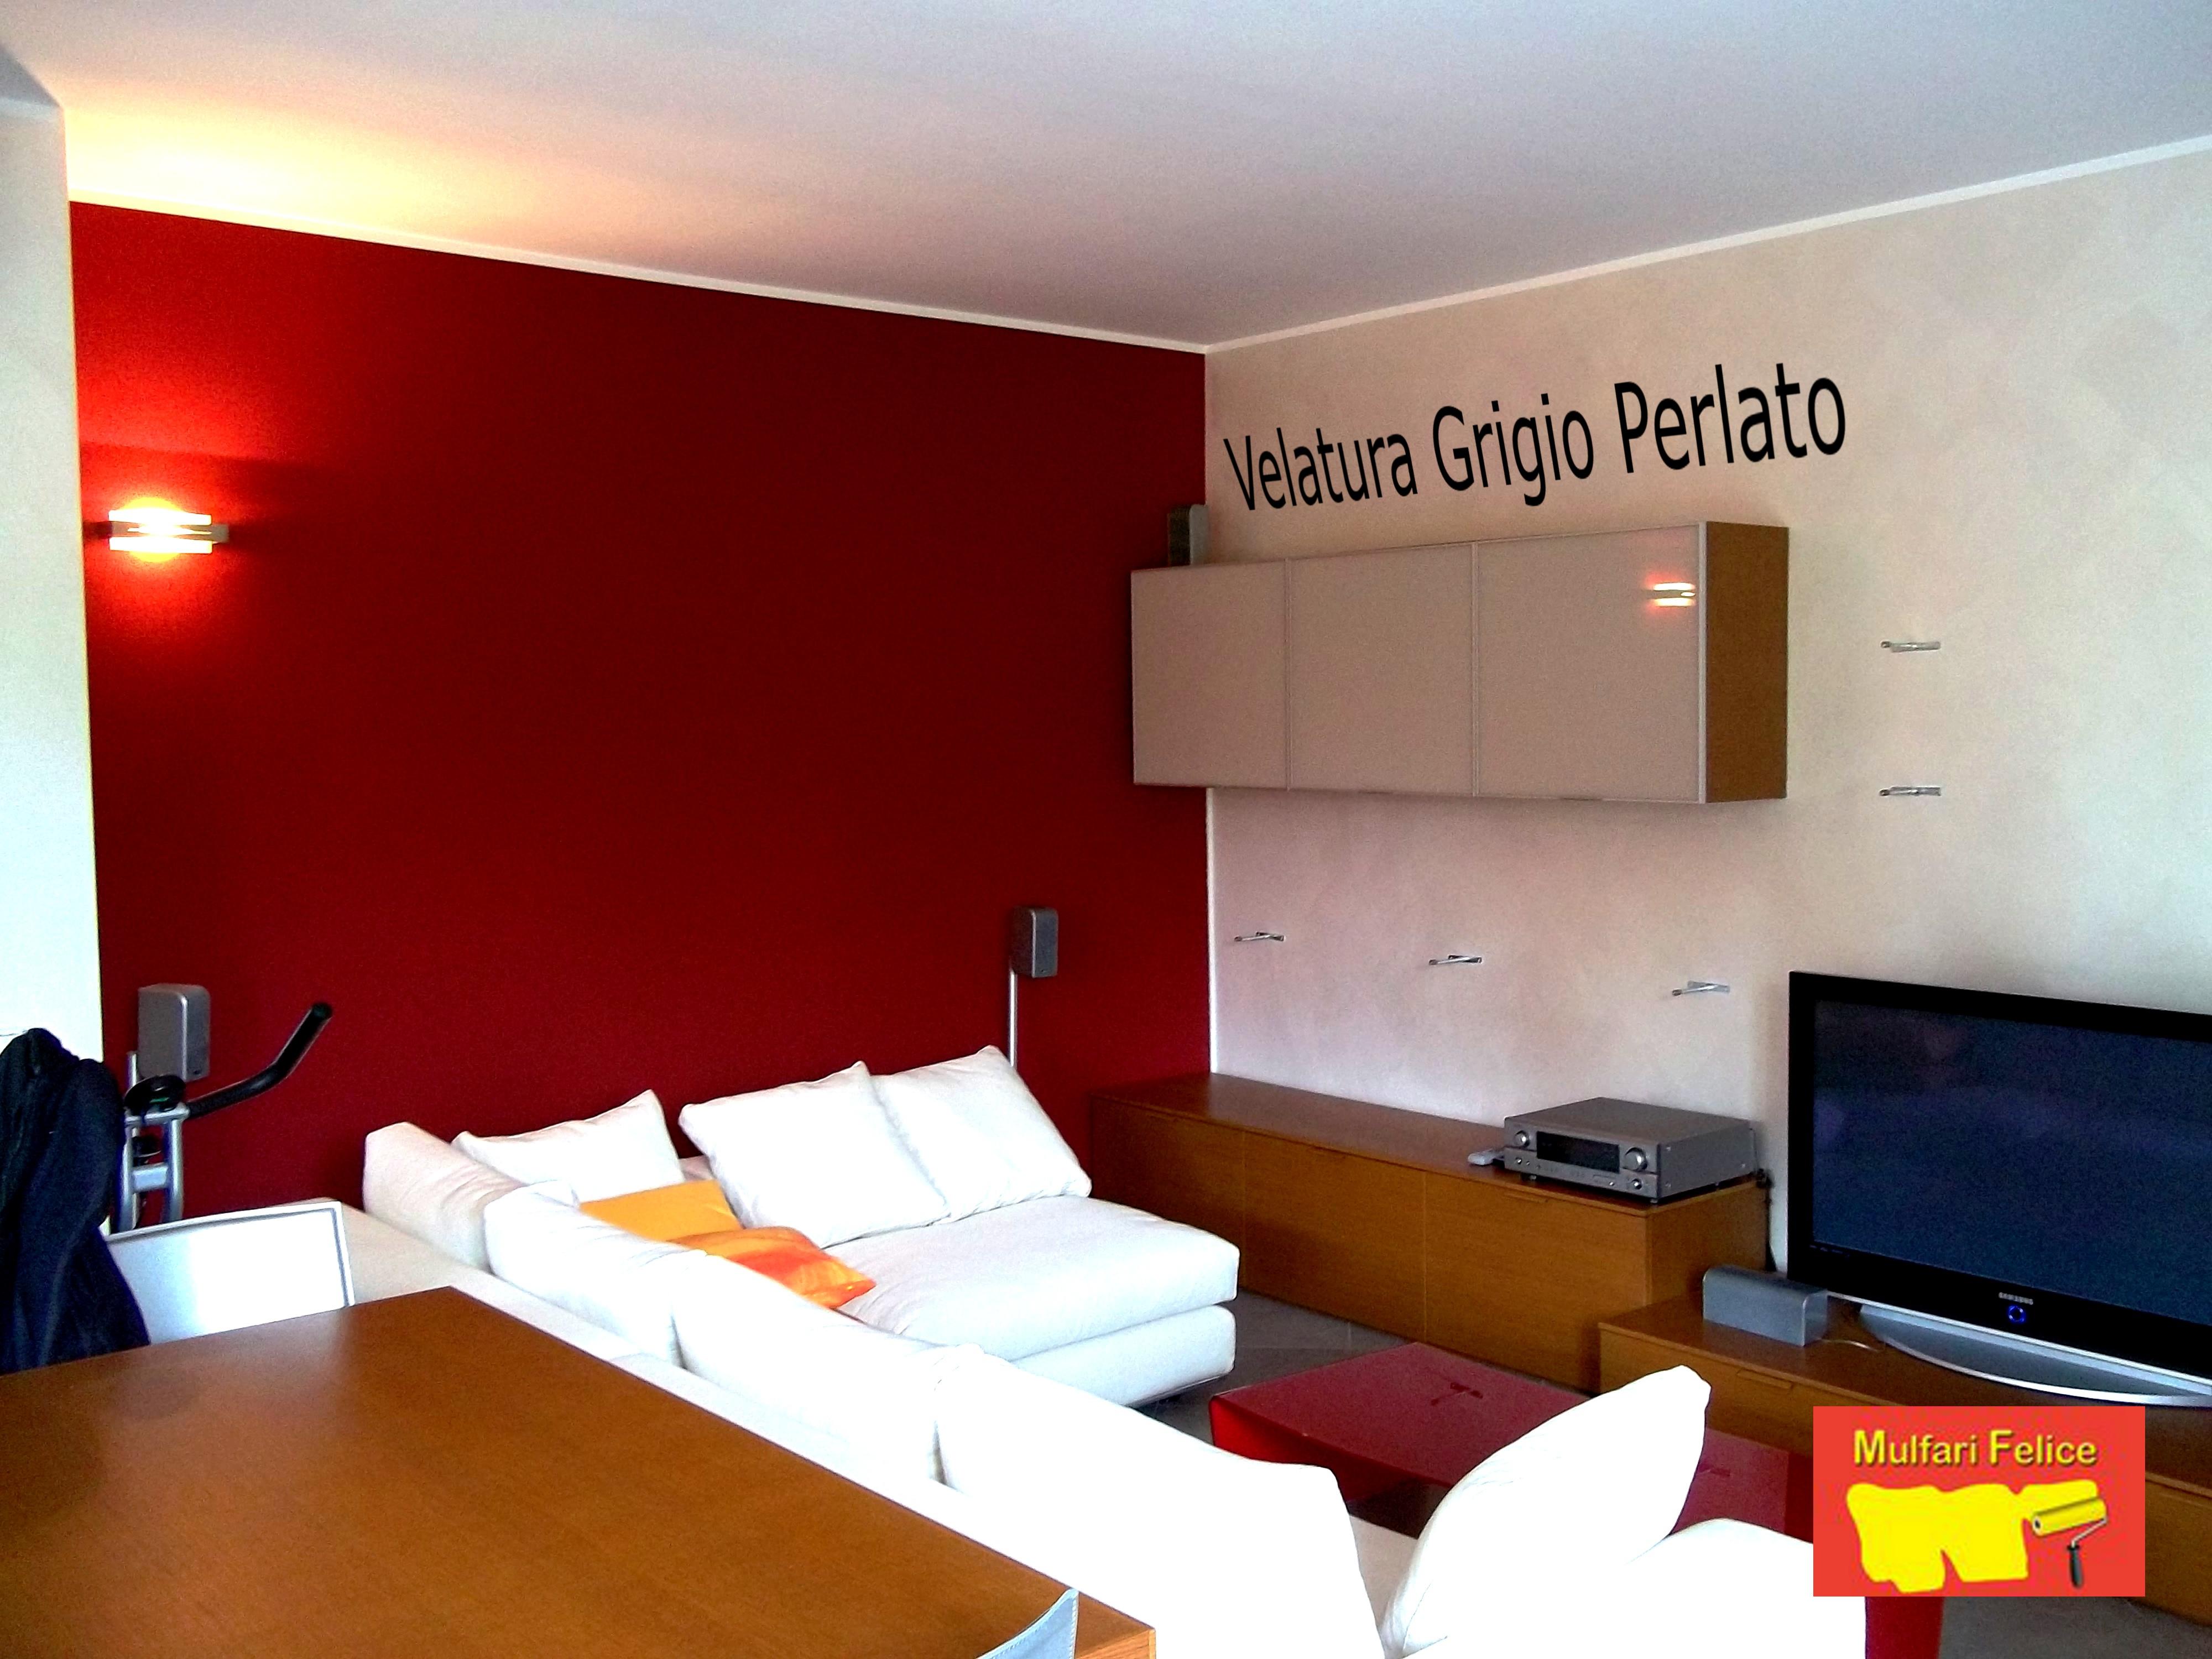 Casa moderna, Roma Italy: Tonalita di grigio per pareti